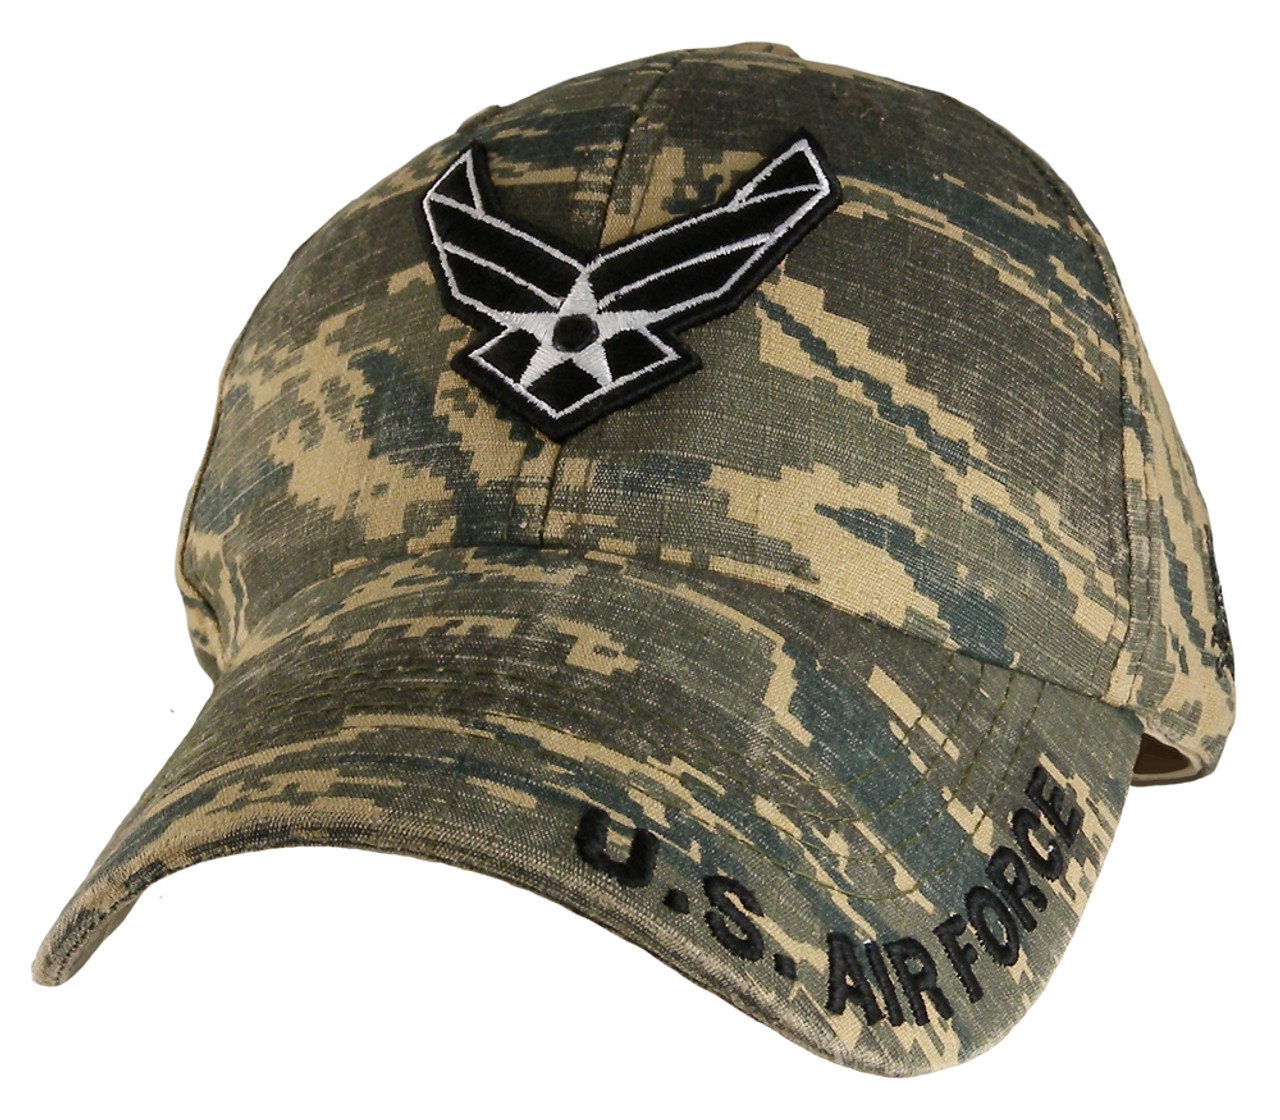 397f7ad42d3 Eagle Crest 6396 - U.S. Air Force Wings Logo Cap Cotton - Digital Camo